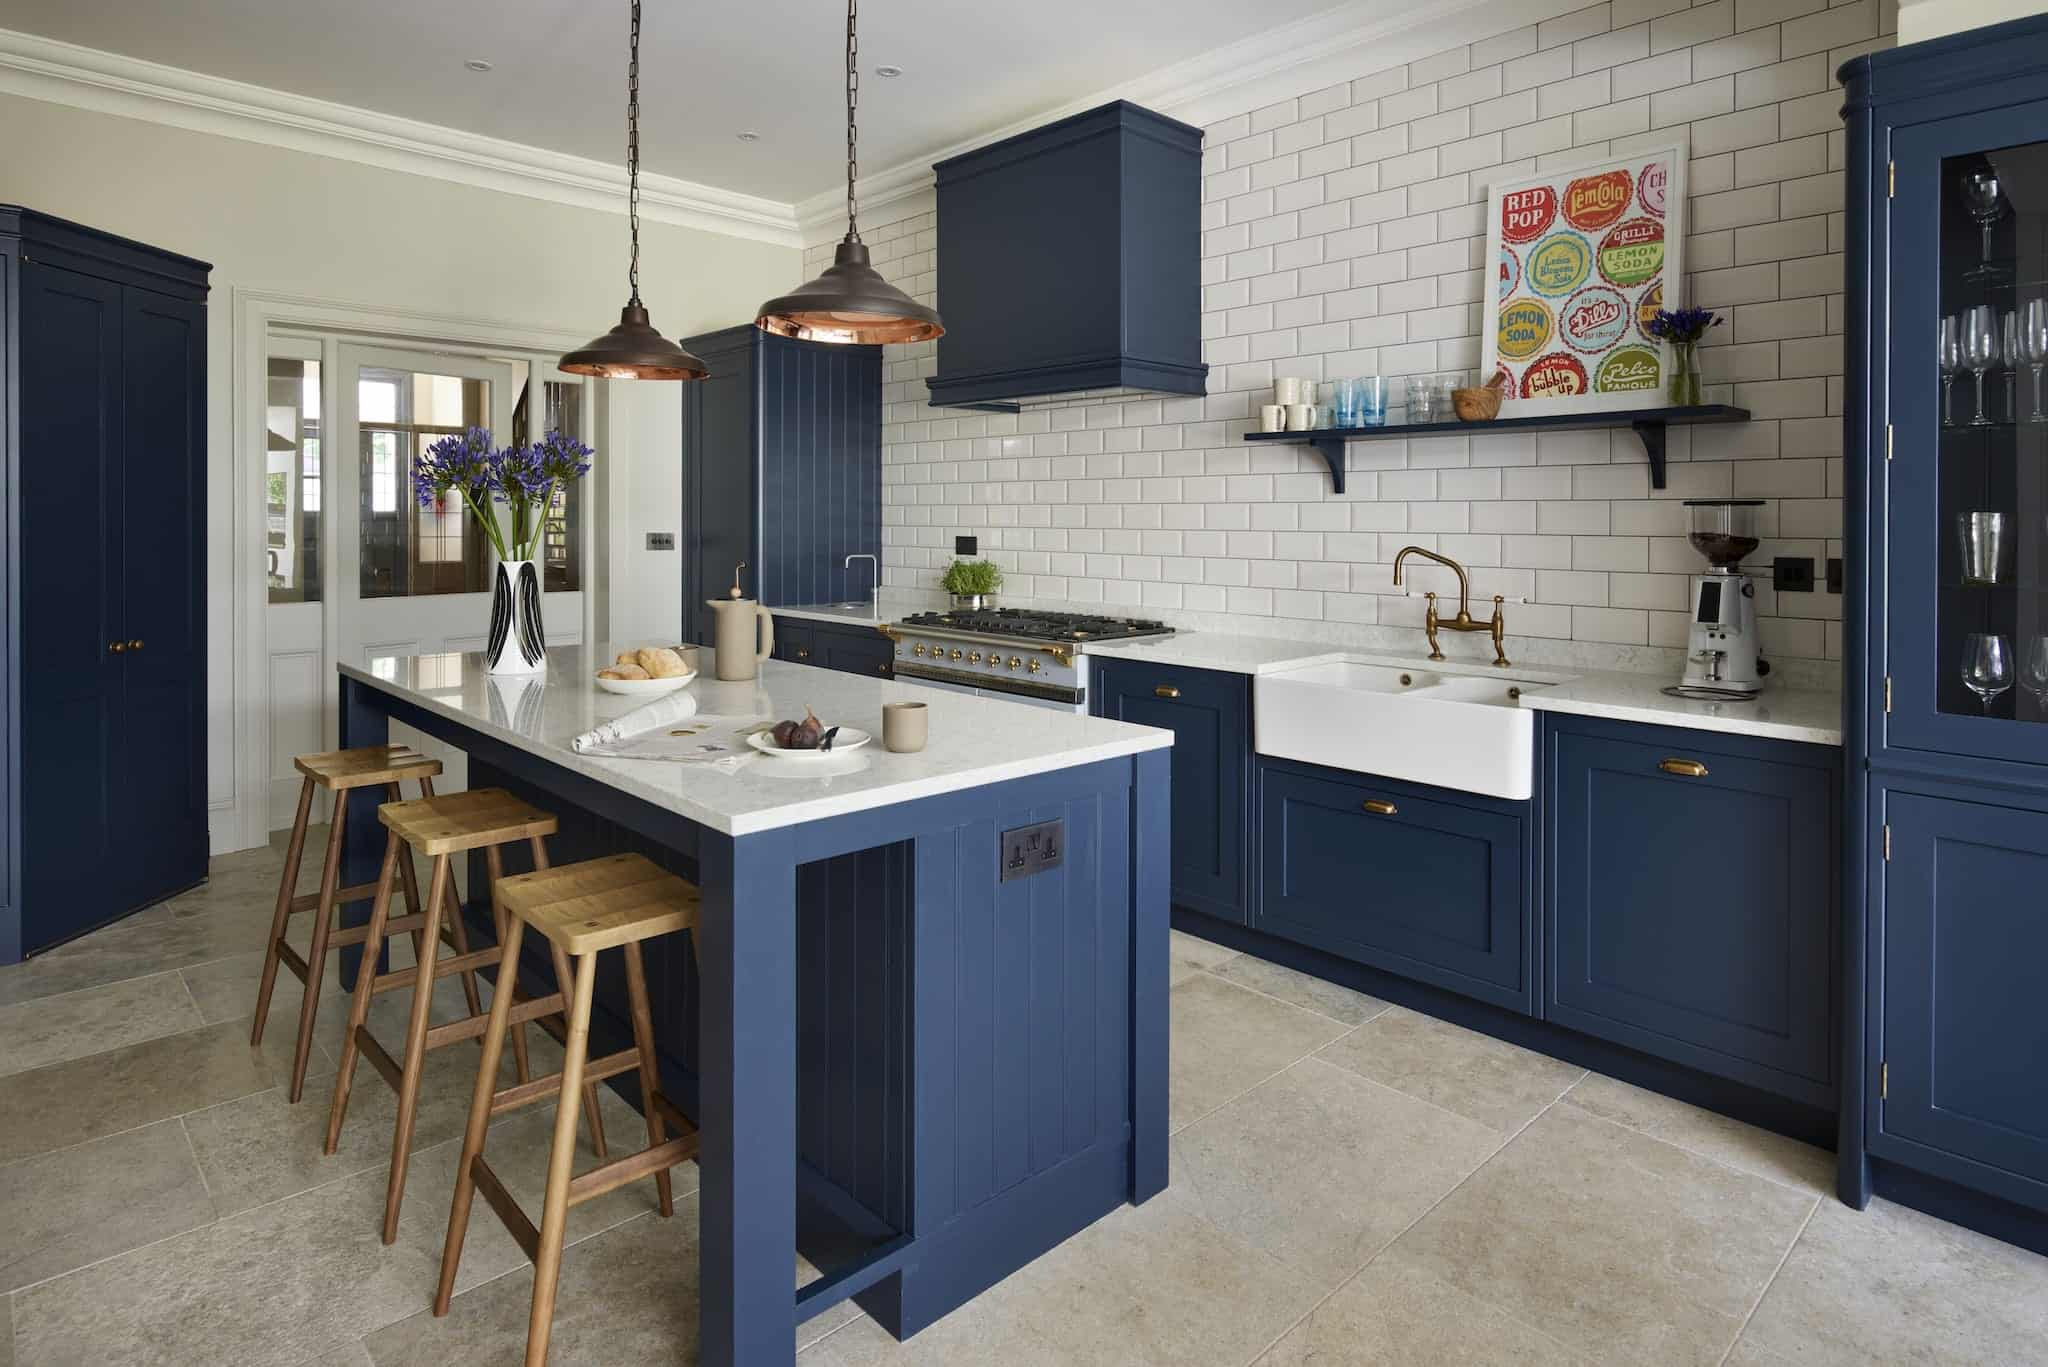 Best Kitchen Renovation Ideas - colour scheme - navy blue -1